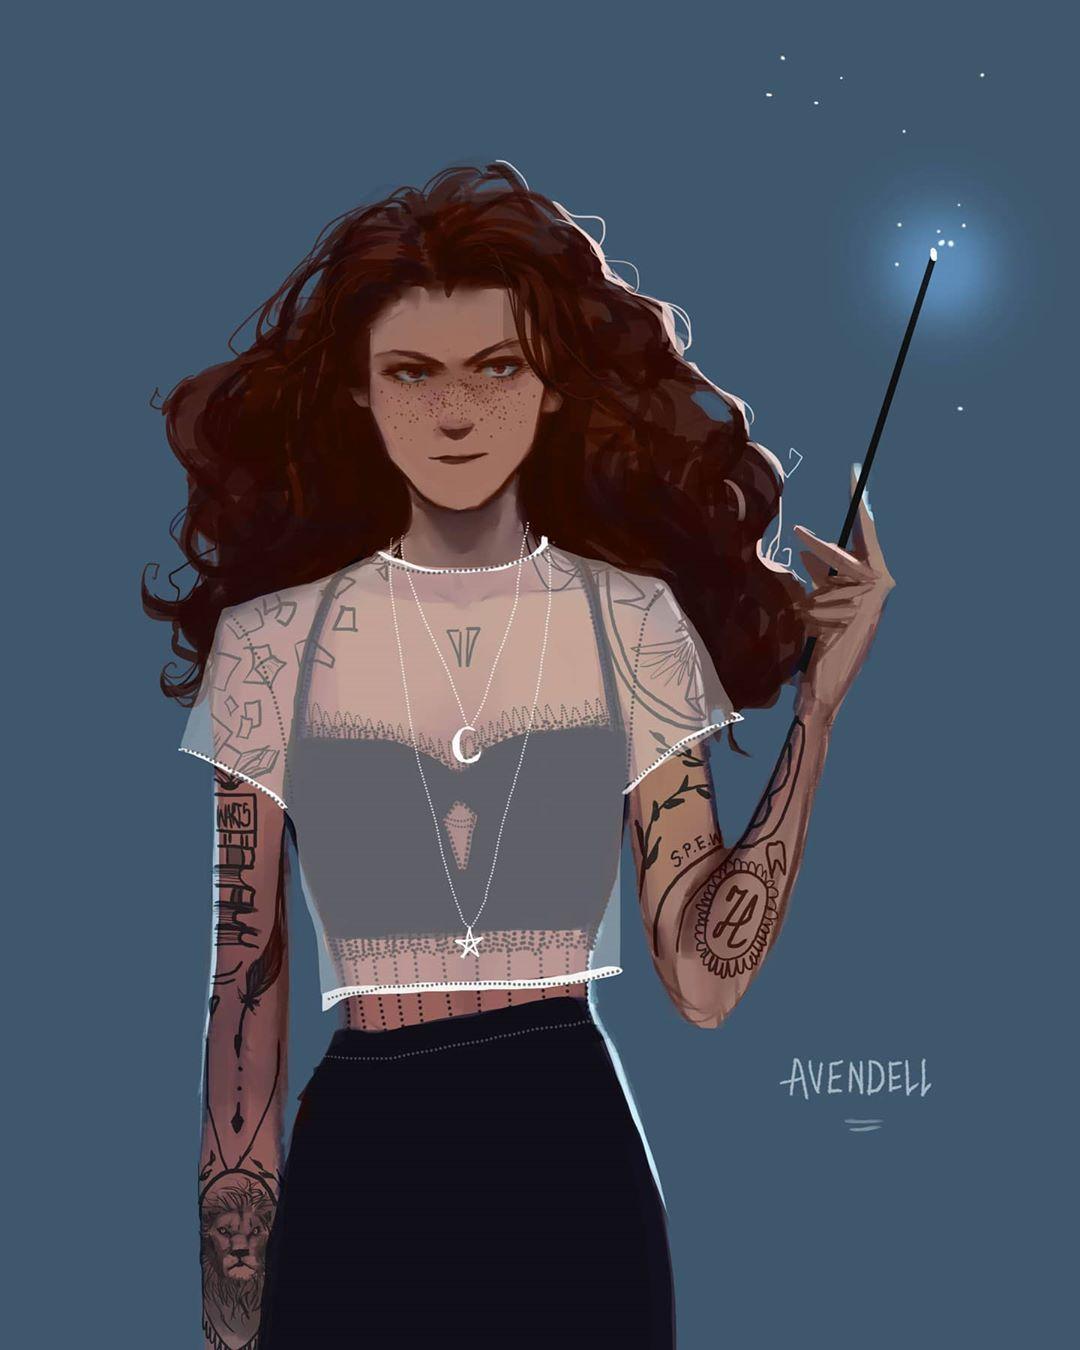 Avendell On Instagram Hermione With Tattoos Hermionegranger Harrypotter Harrypotterfanart Illus I 2020 Harry Potter Harry Potter Bakgrund Bakgrund